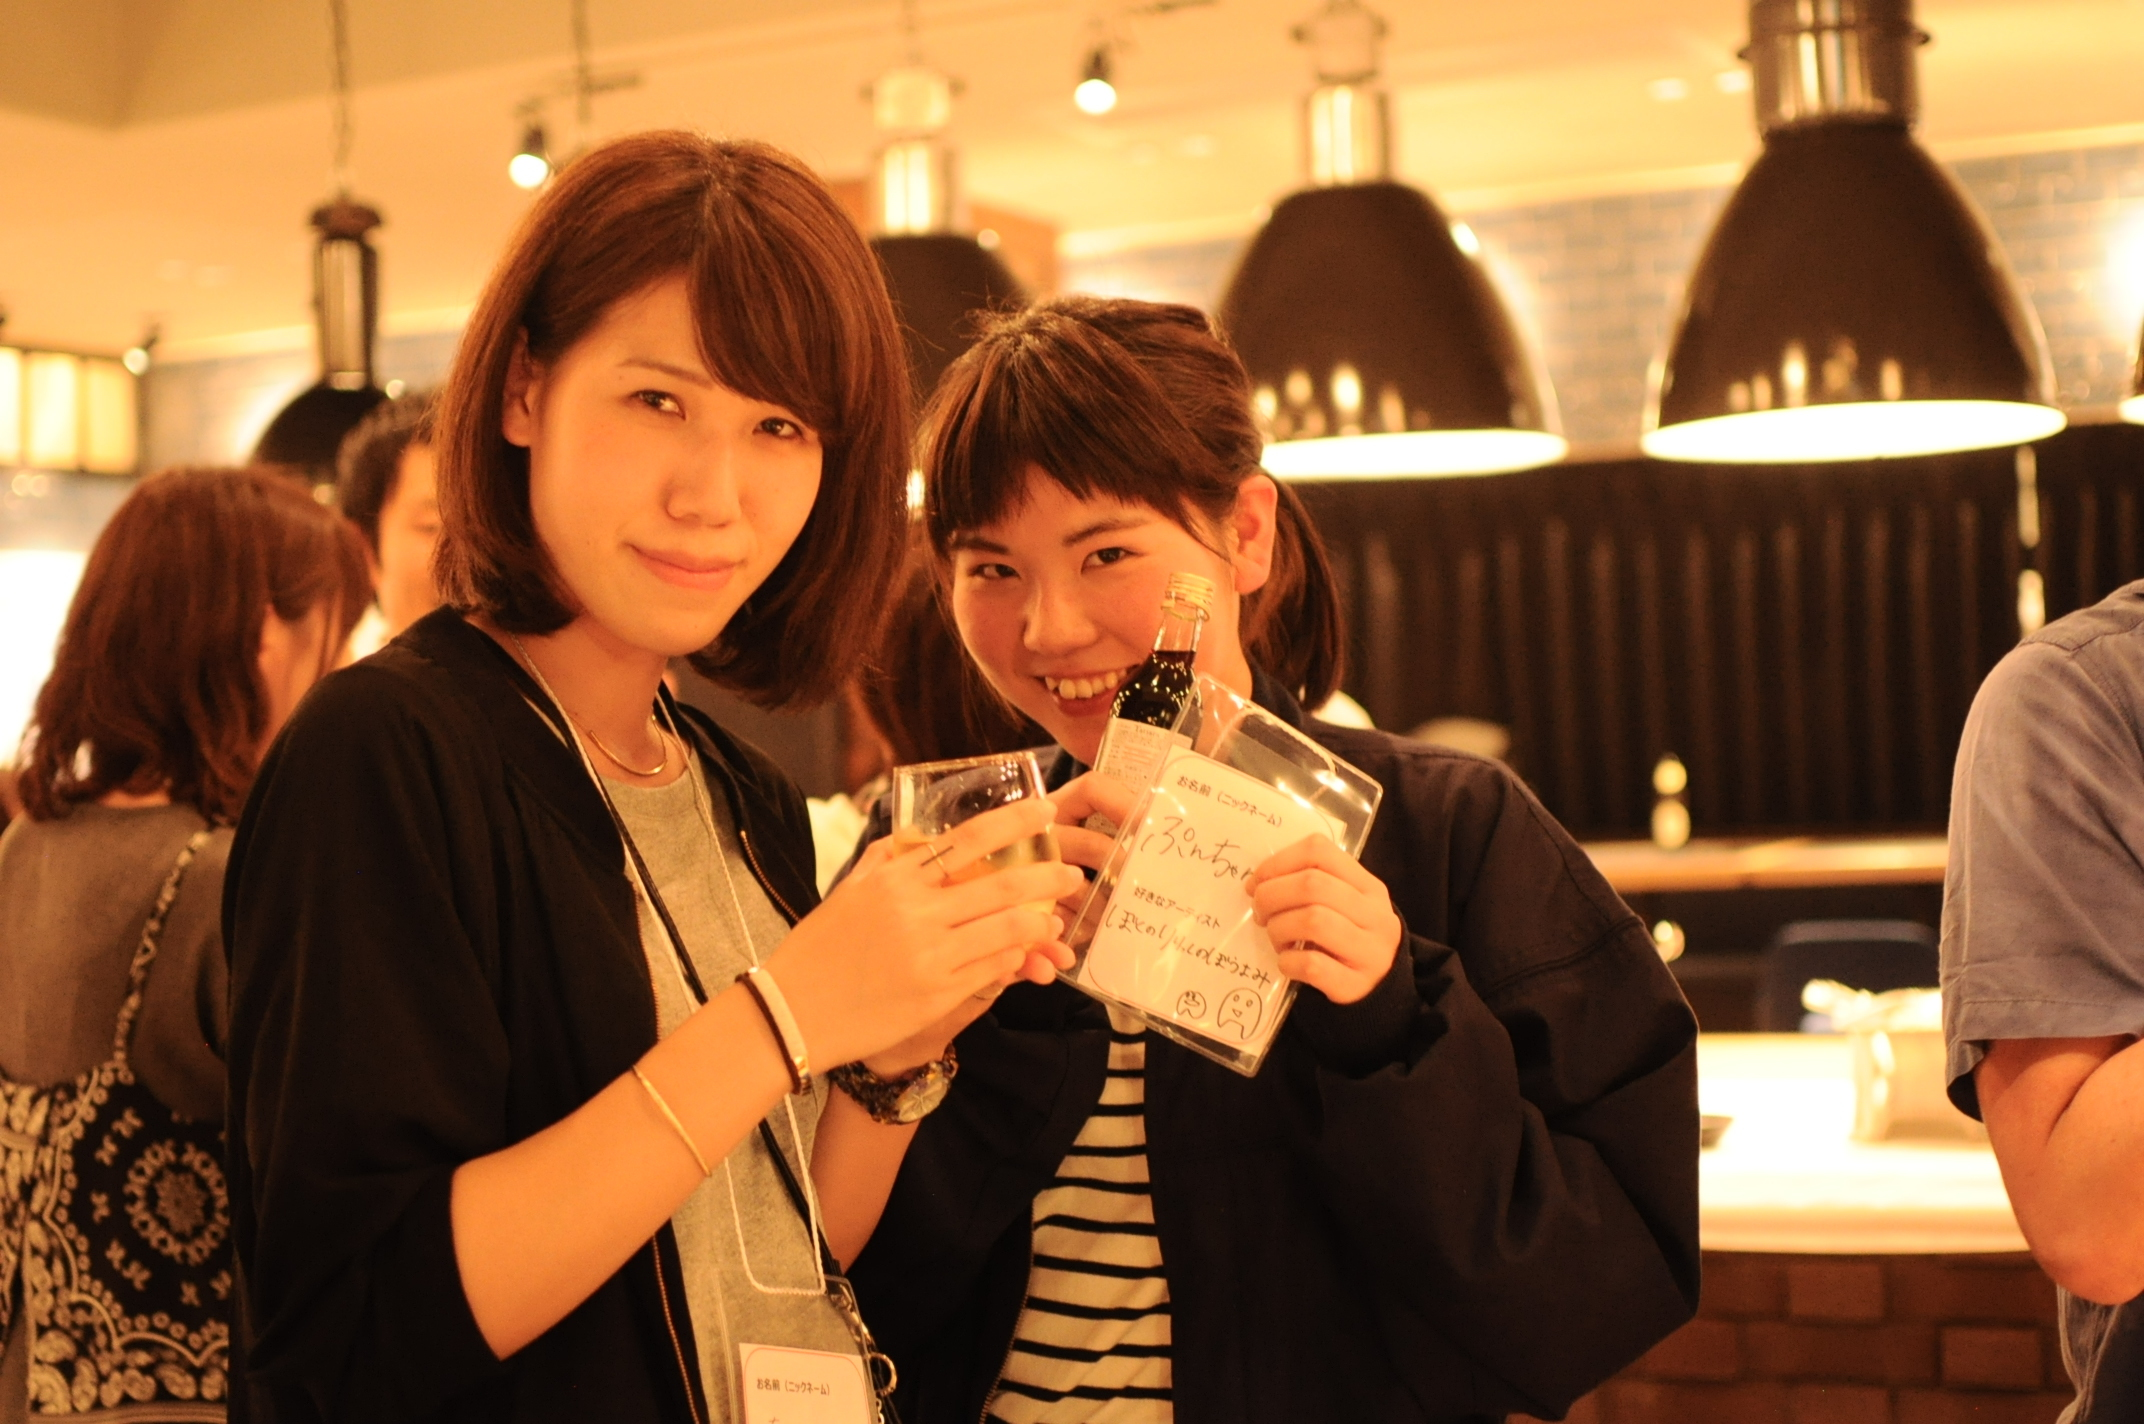 Photo by Taiyo Kazama